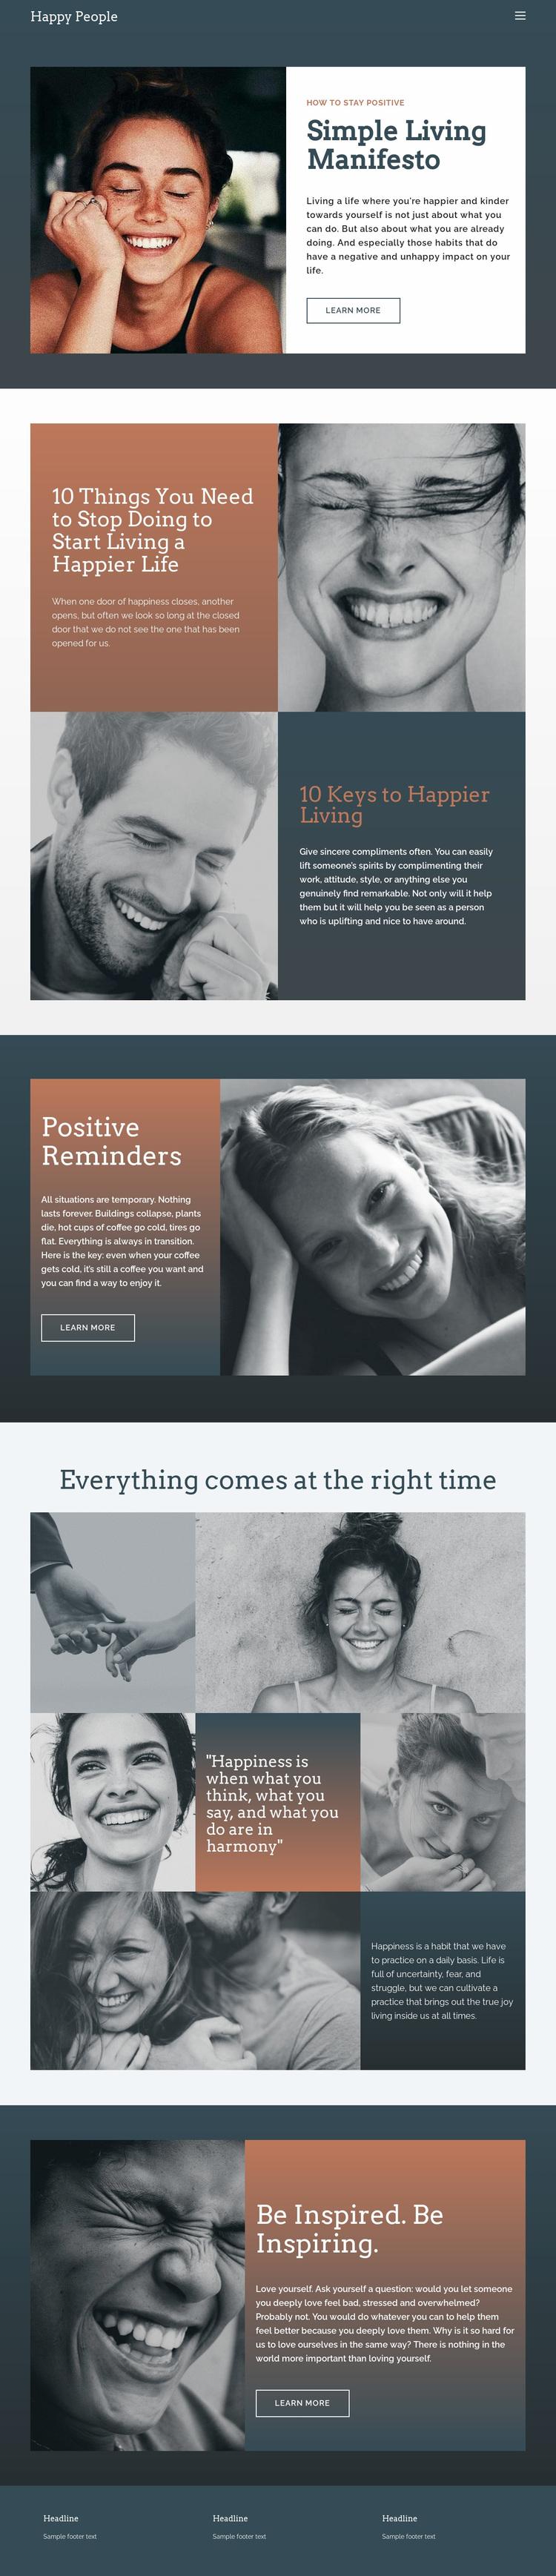 Simple living manifesto Web Page Designer